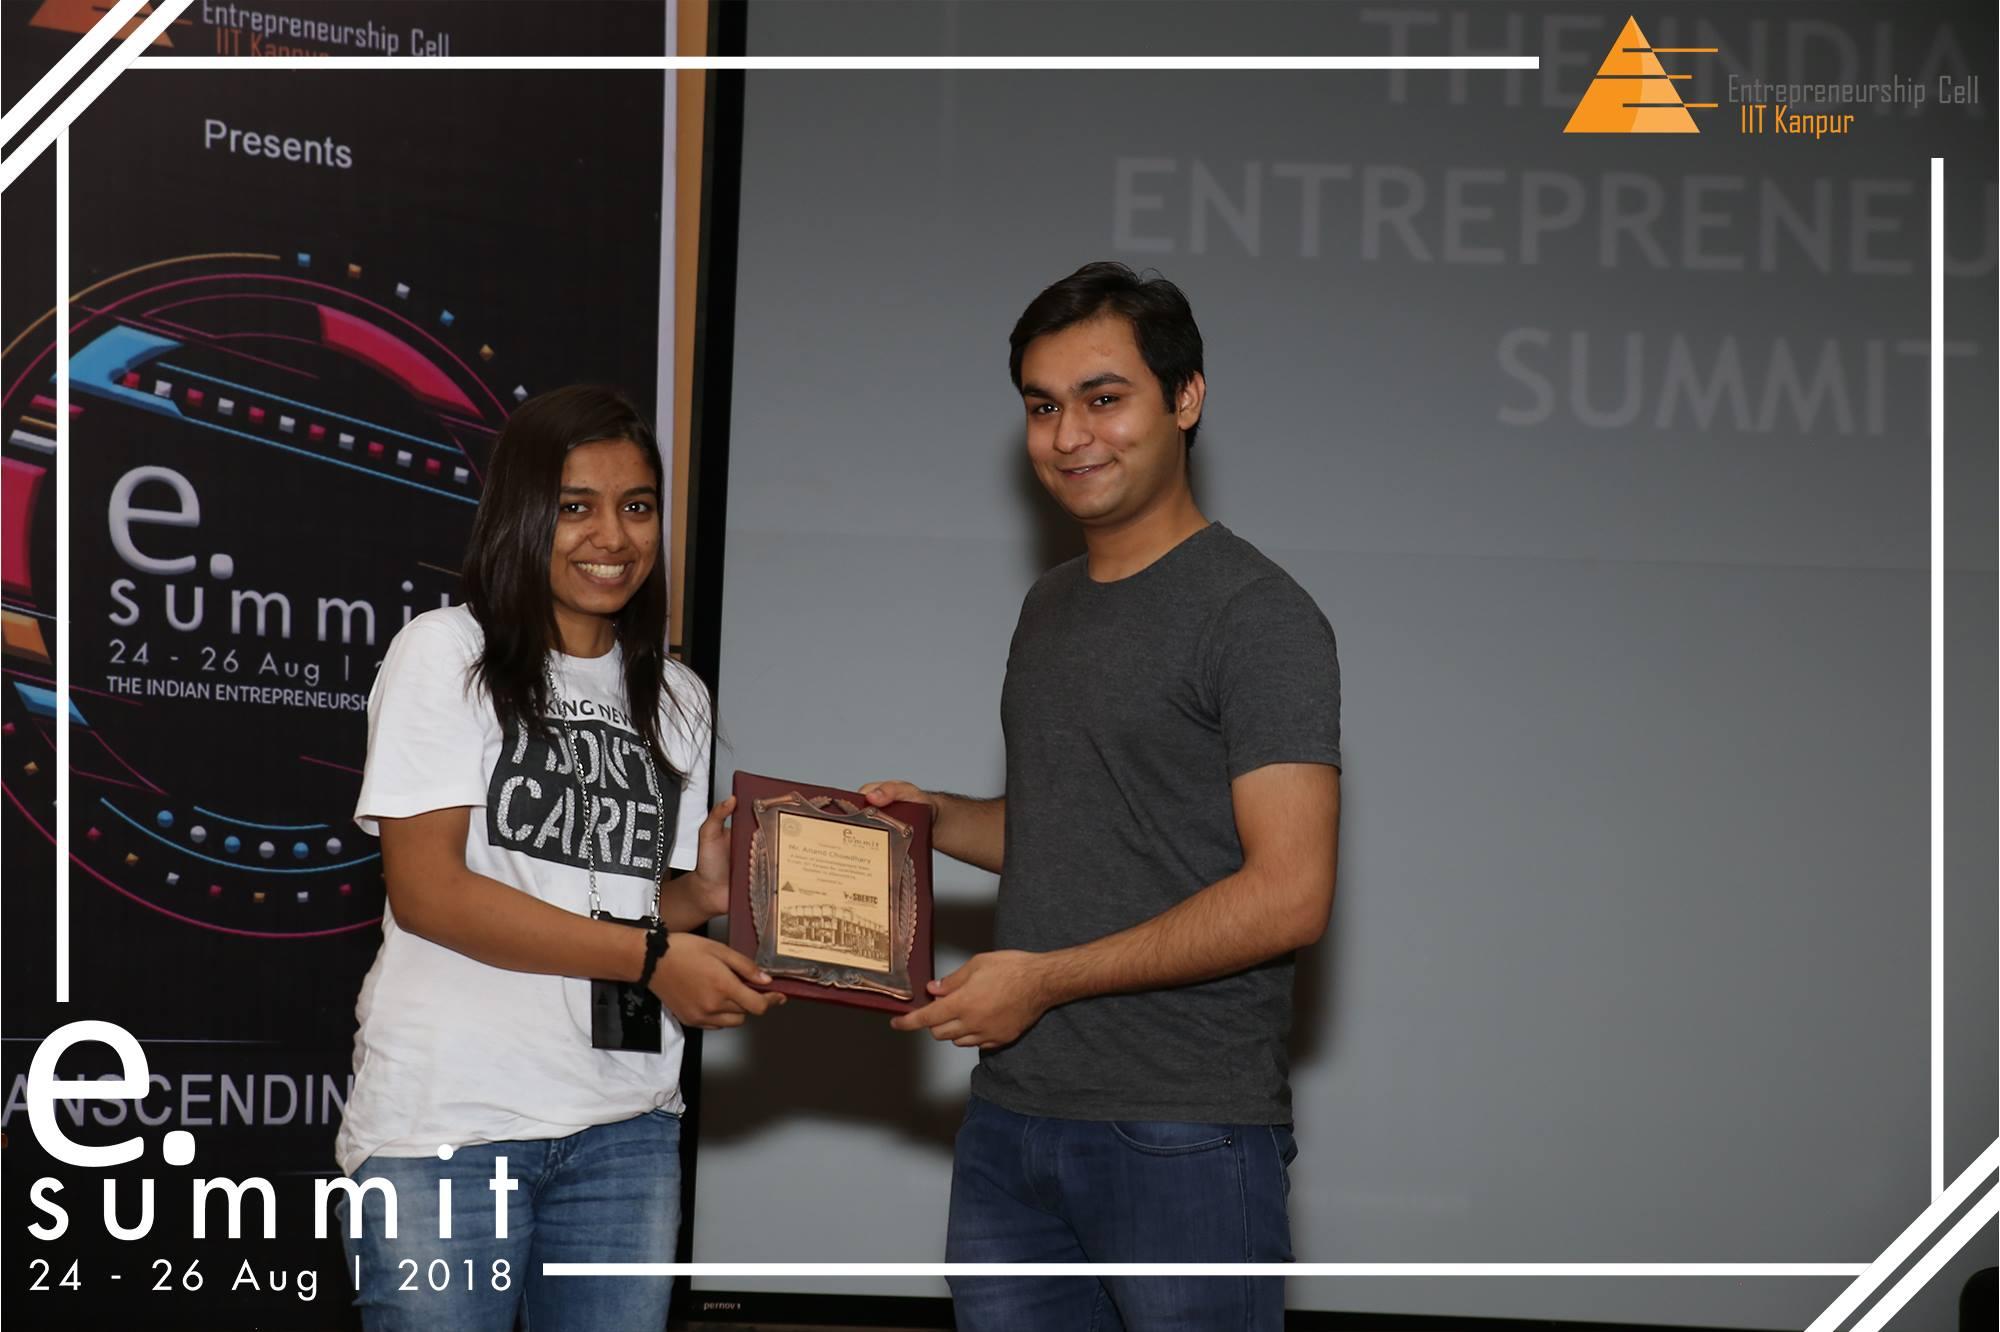 Anand Chowdhary receiving an award